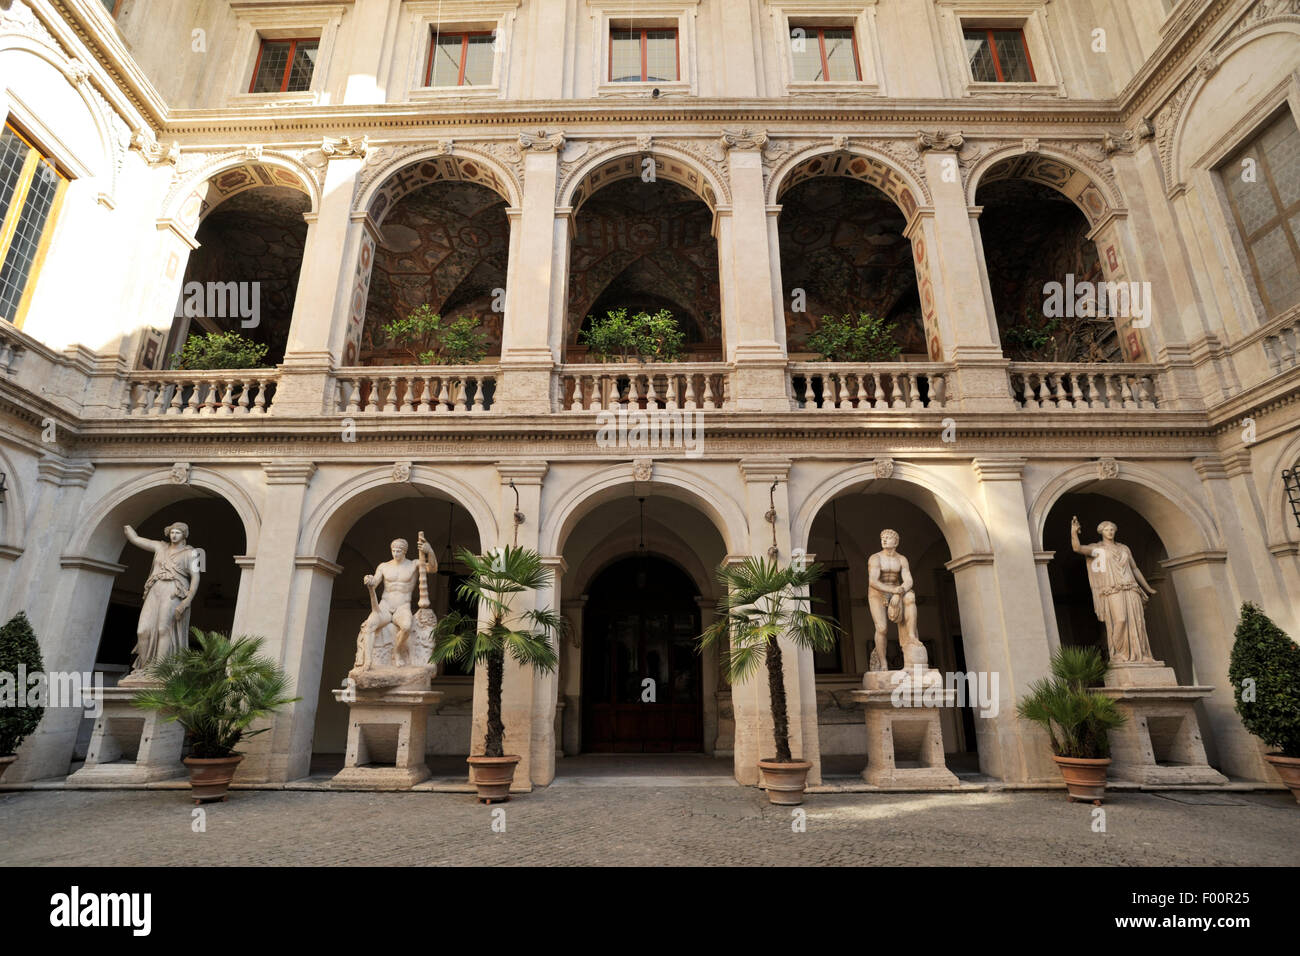 italy, rome, palazzo altemps, museo nazionale romano, roman national museum - Stock Image